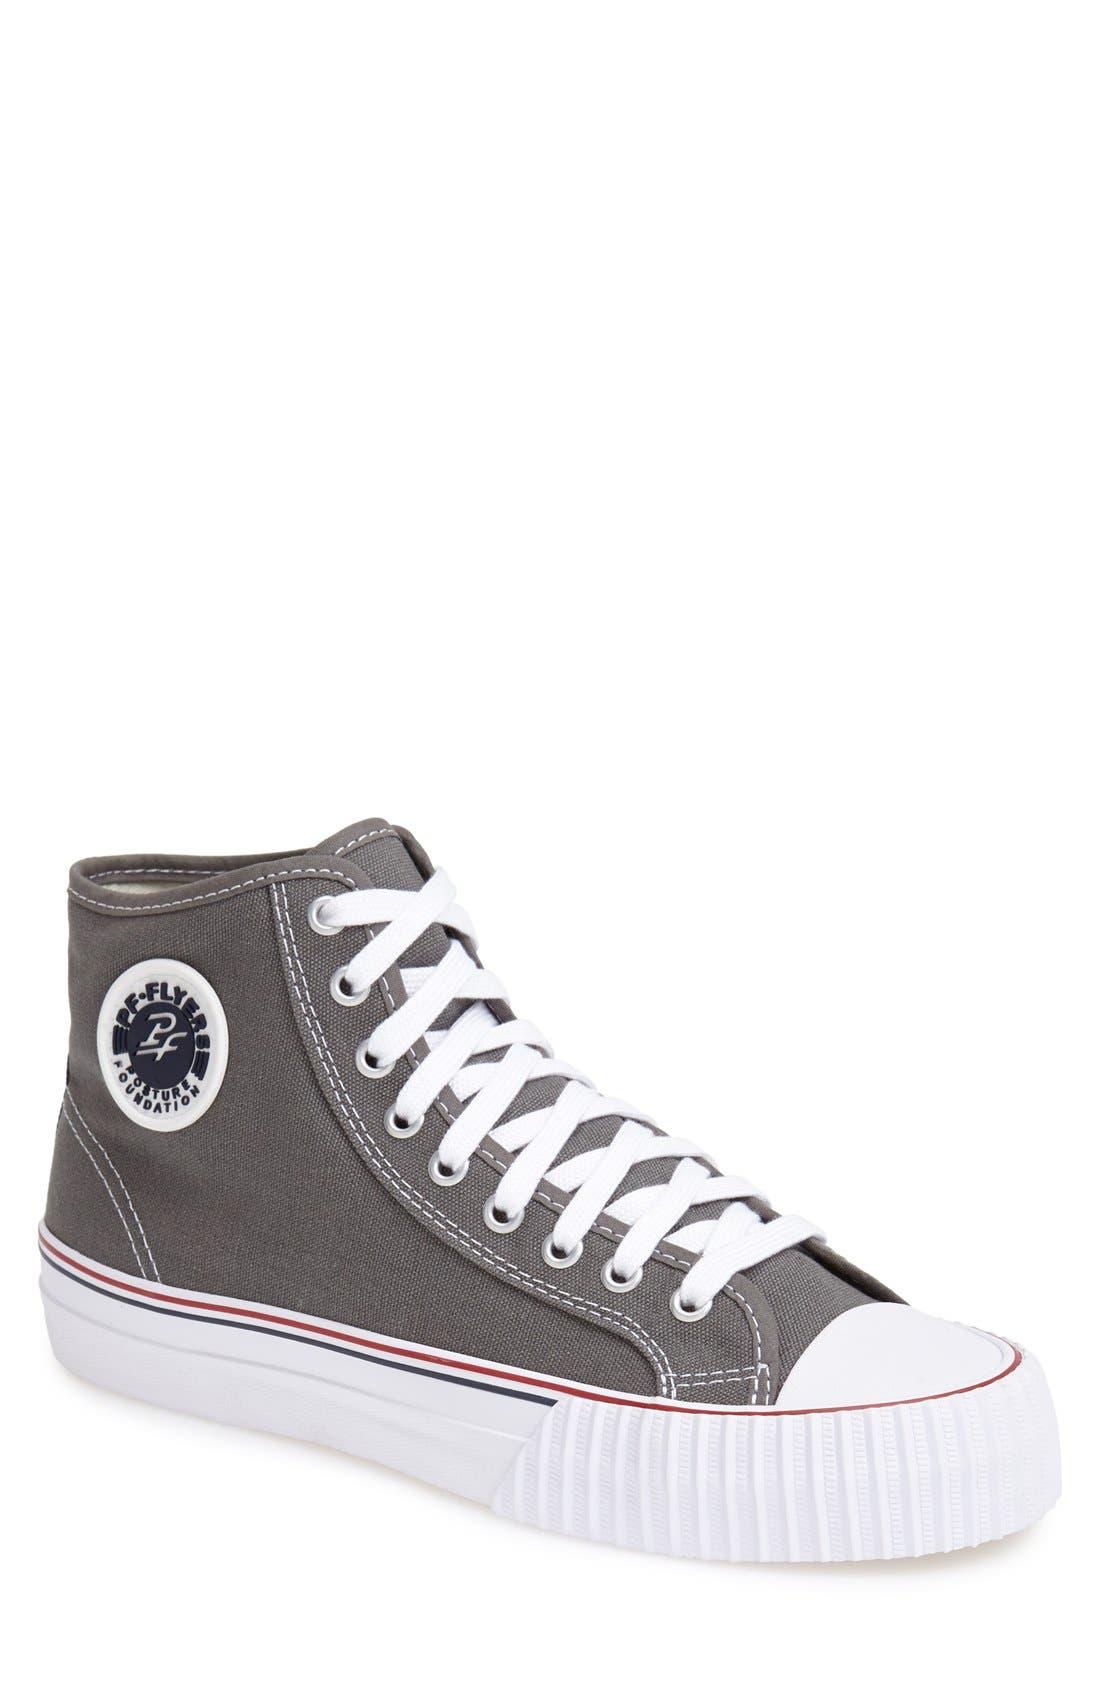 'Center Hi' Canvas Sneaker,                             Main thumbnail 1, color,                             030